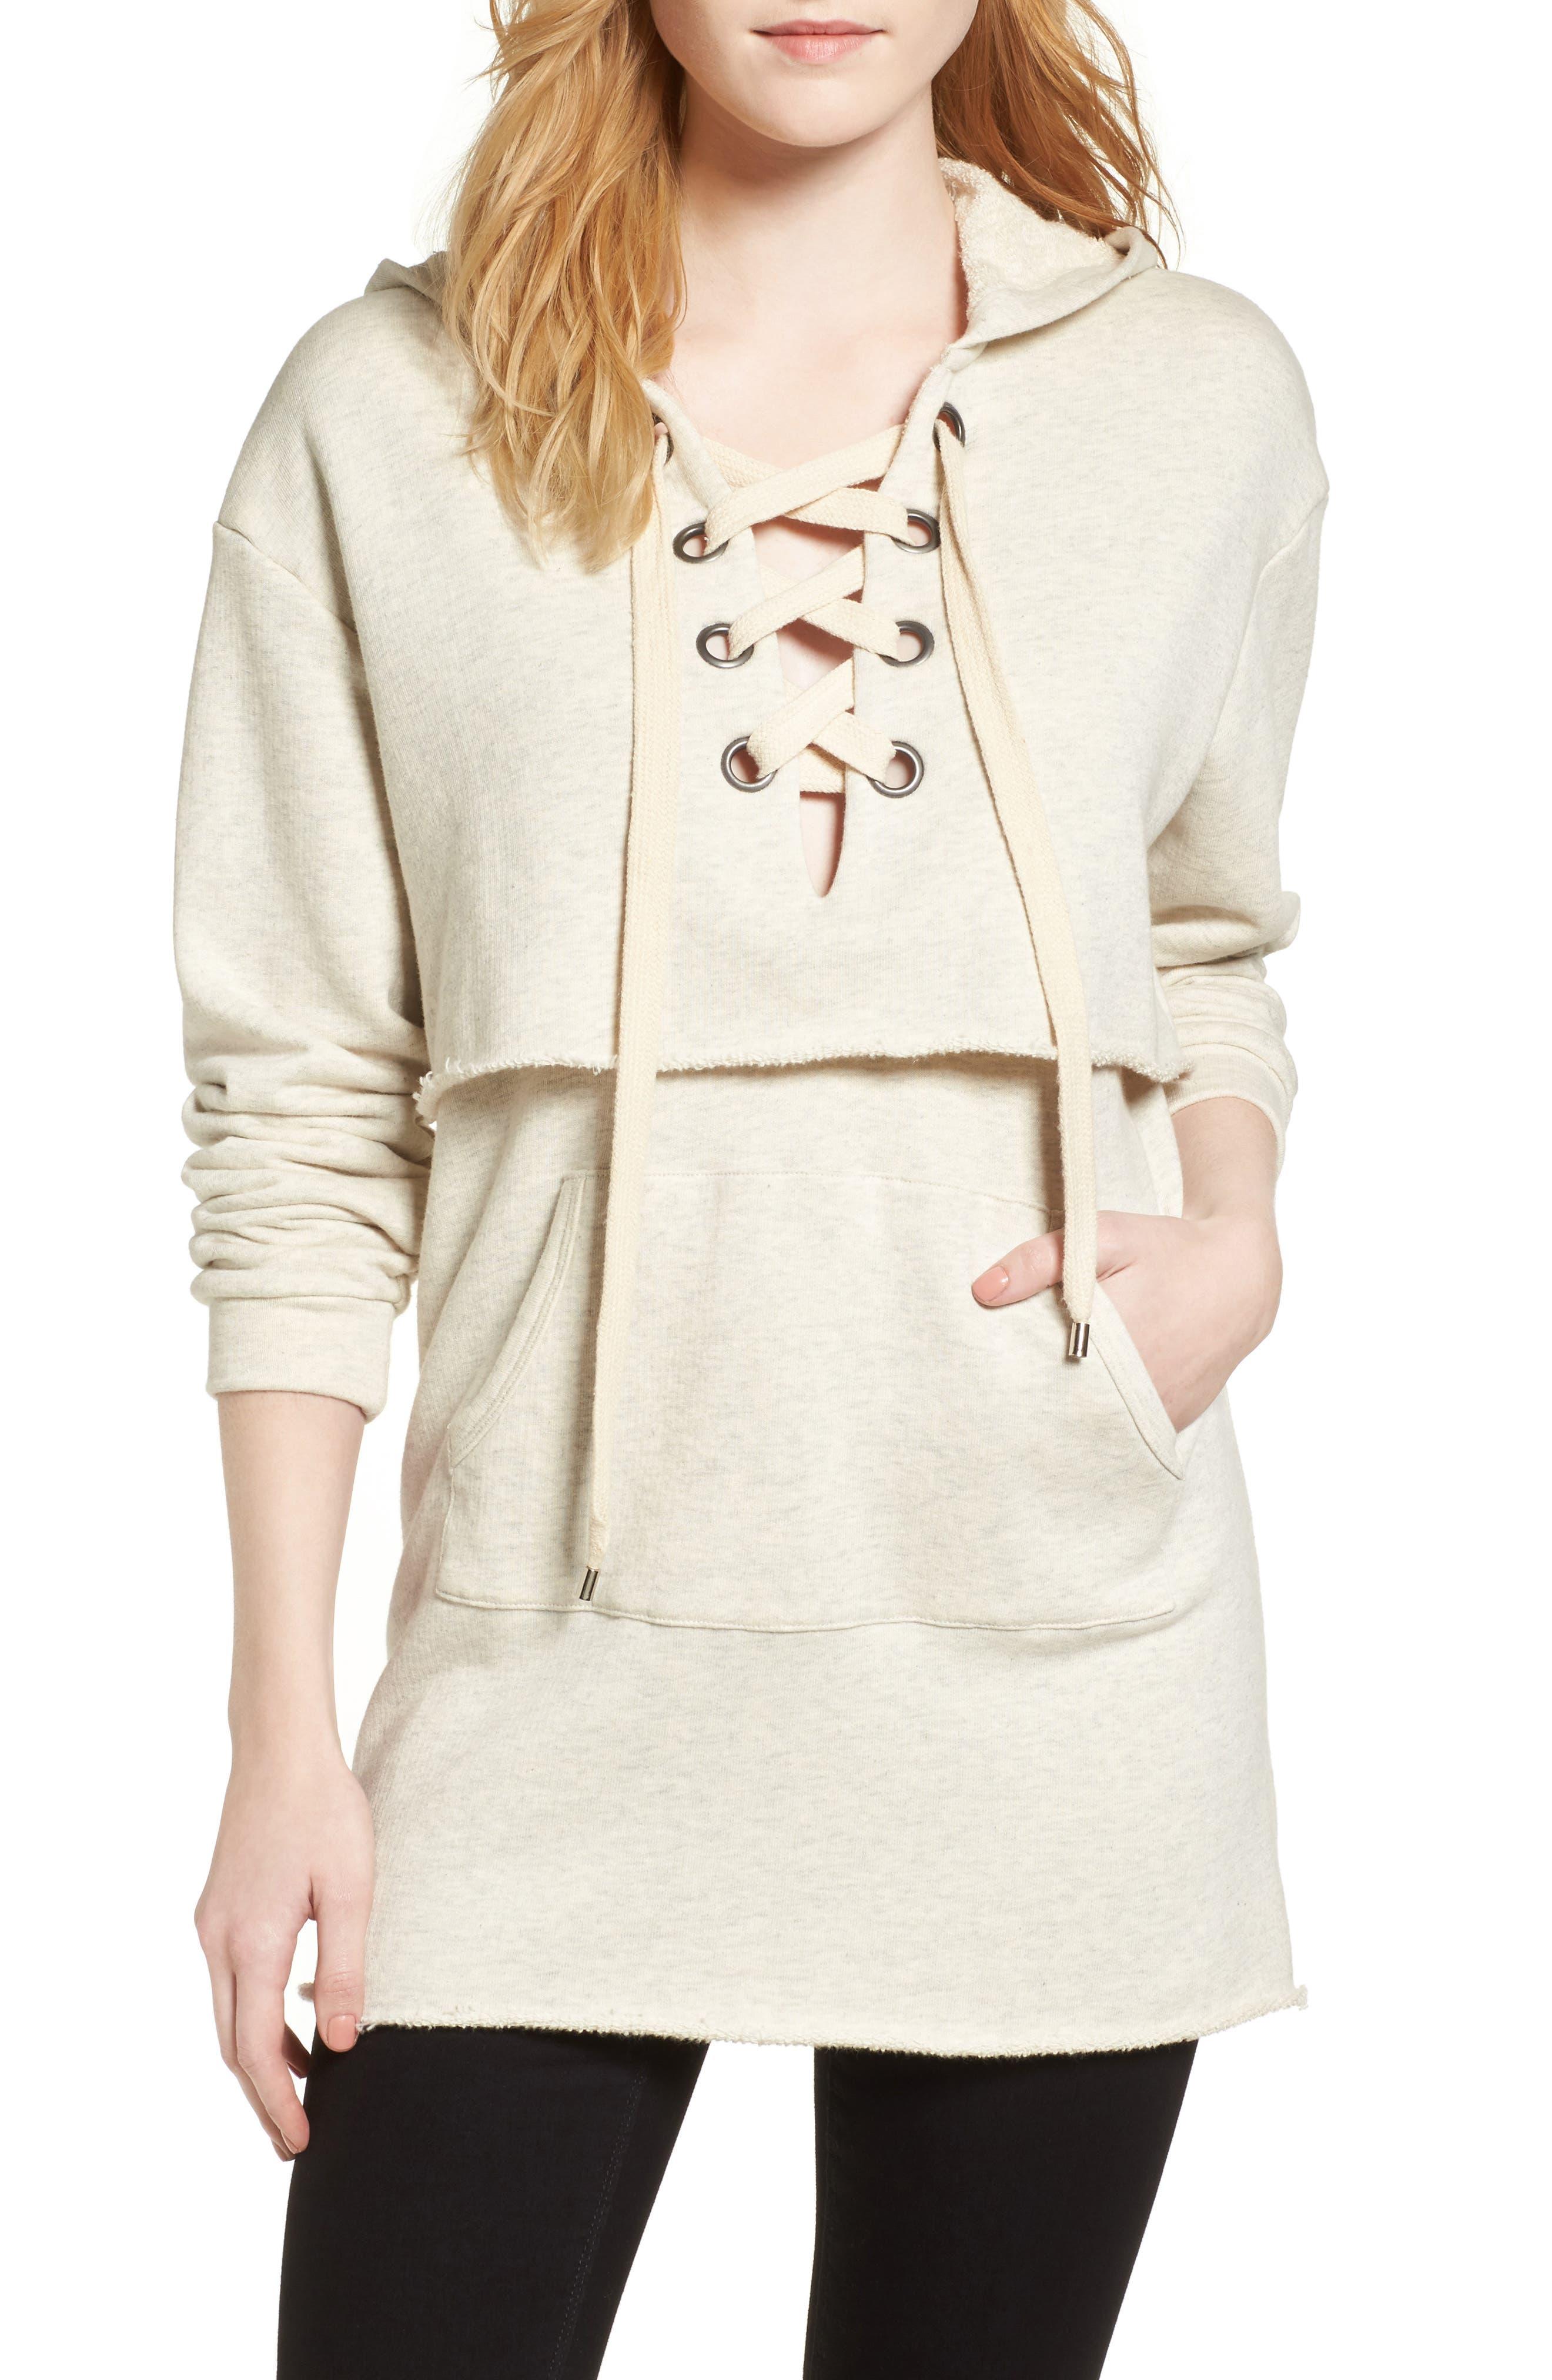 KENDALL + KYLIE Layered Sweatshirt Dress